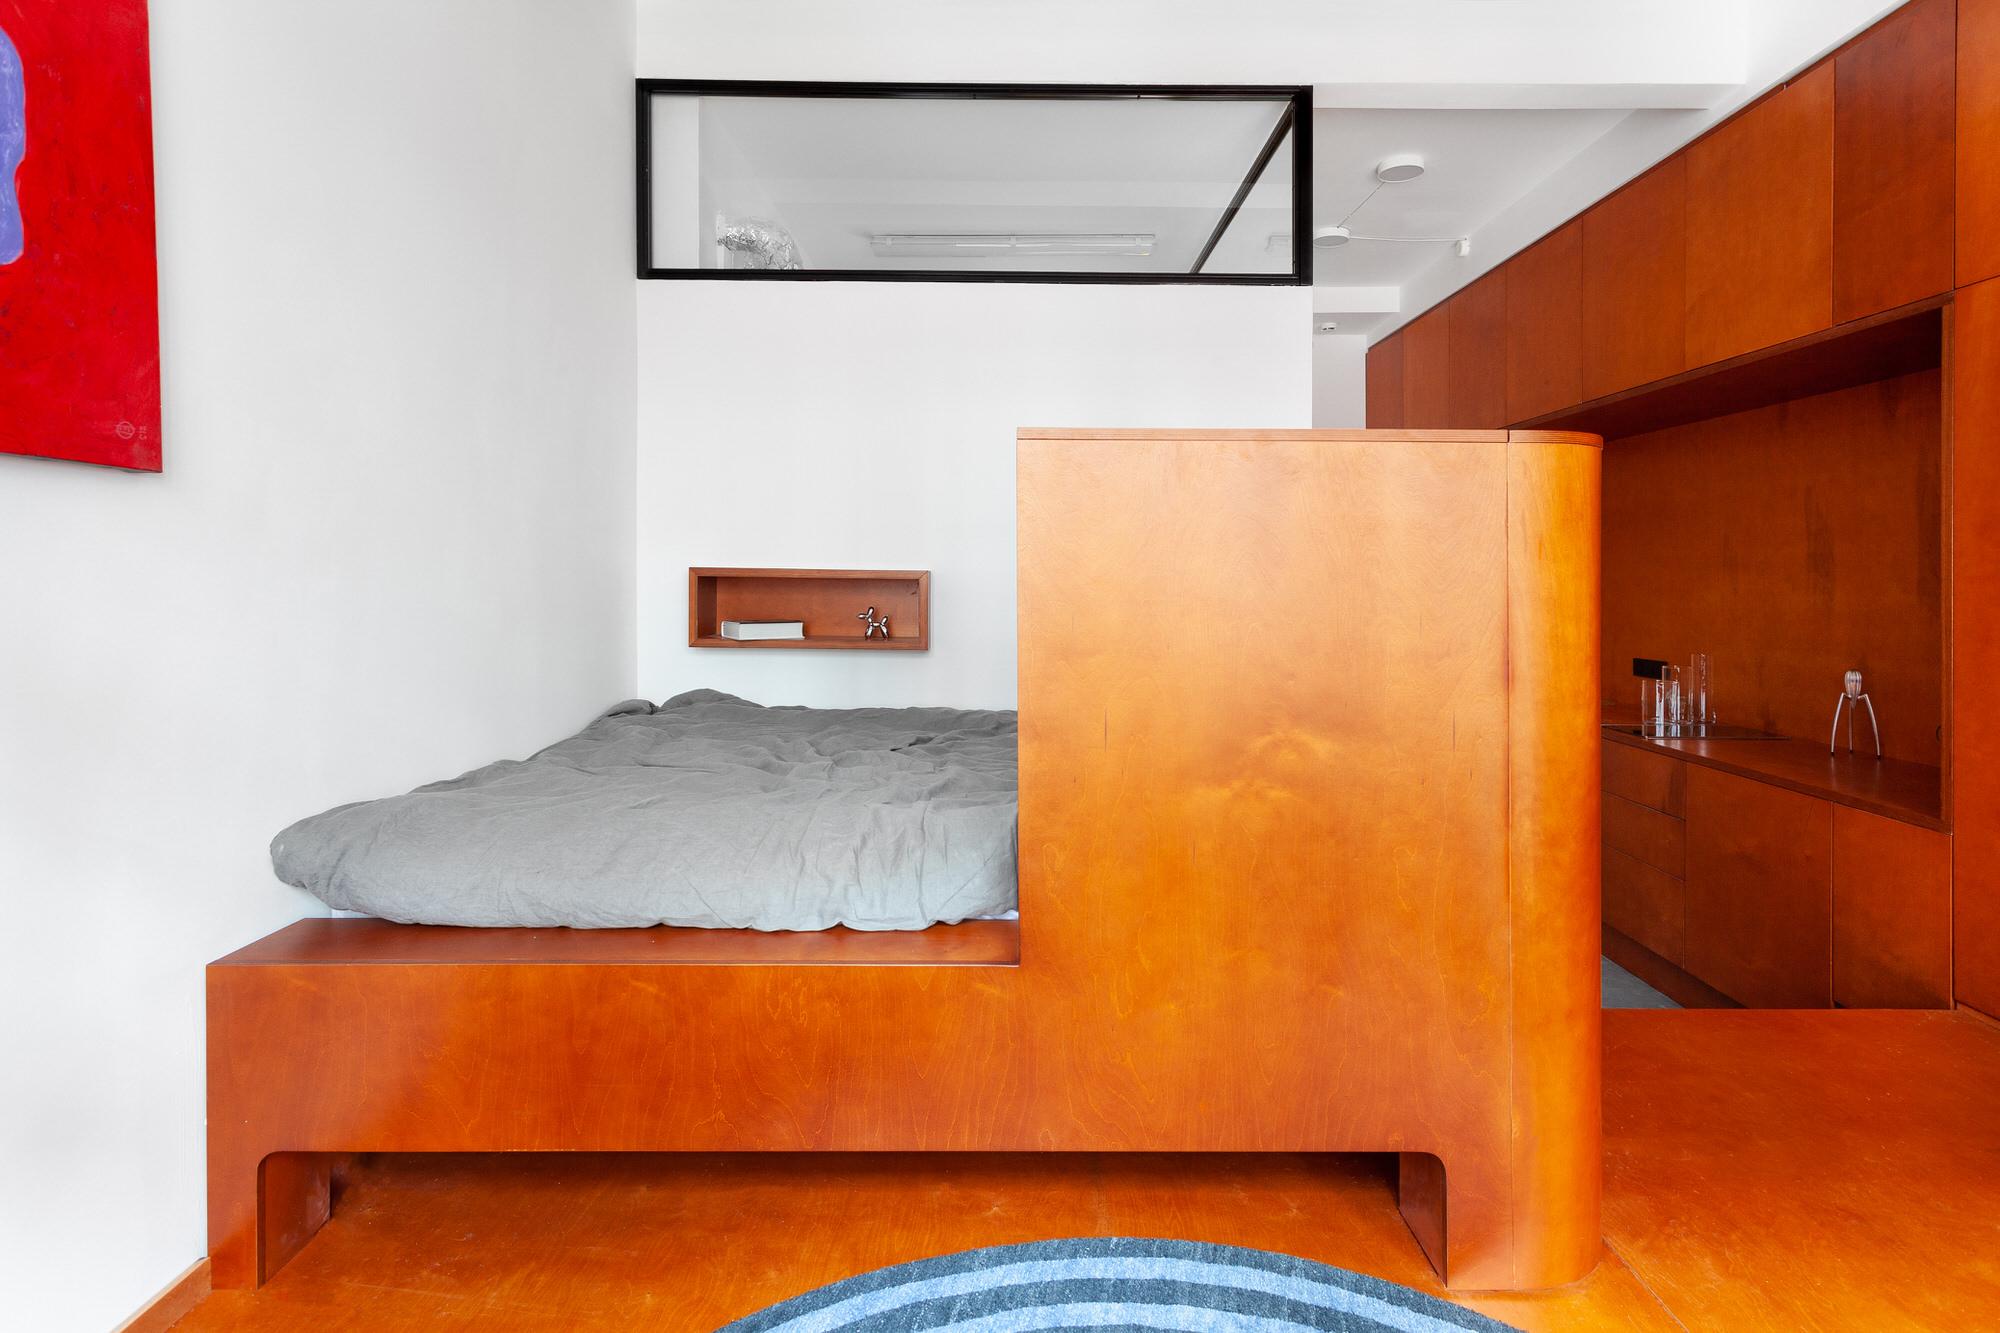 Room Design Buro Commune 303 Tiny Moscow Apartment Interior Photo Polina Poludkina Yellowtrace 17